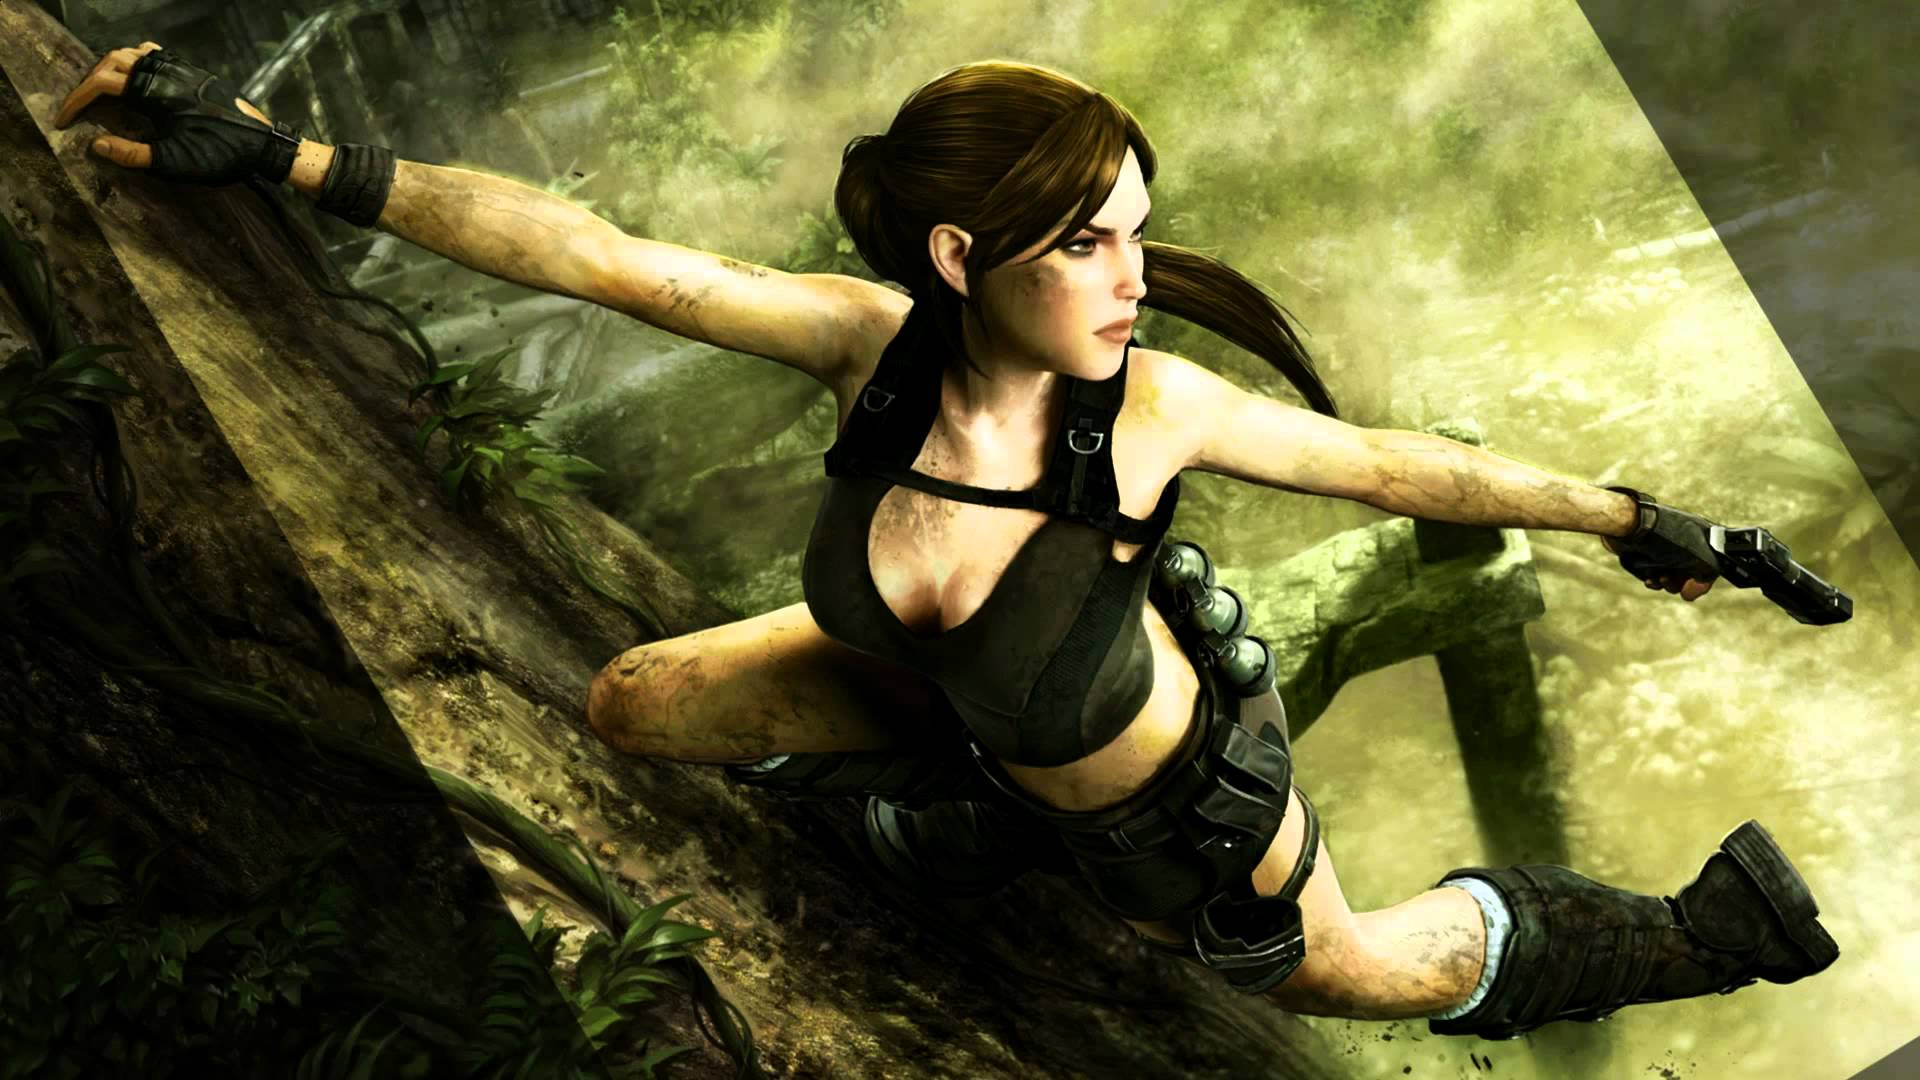 Tomb Raider Underworld 1920x1080 Wallpaper Teahub Io